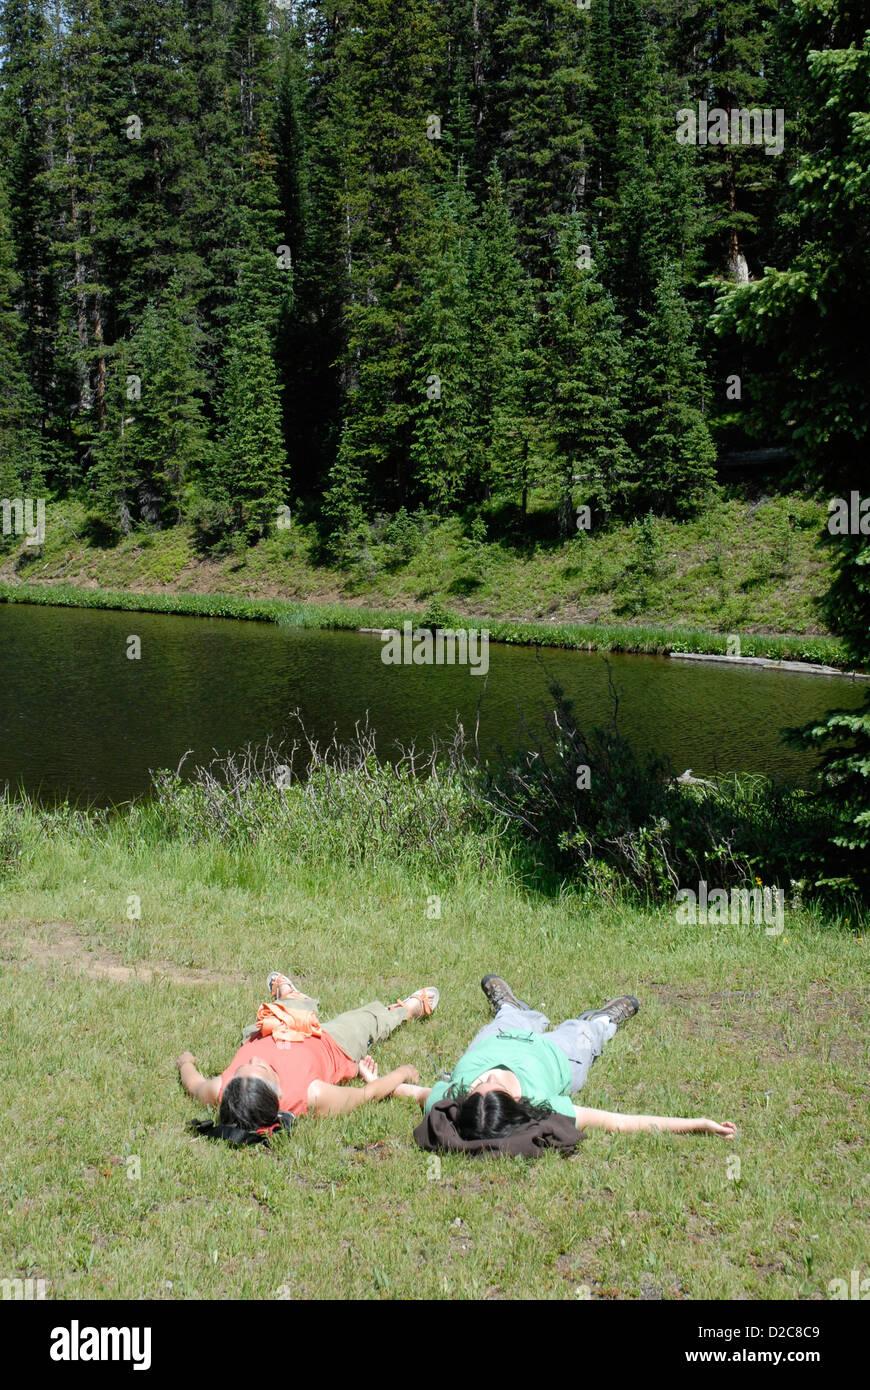 Women Sunbathing, Ignoring Ultraviolet Warnings, Lake Irene, Rocky Mt. National Park, Colorado - Stock Image